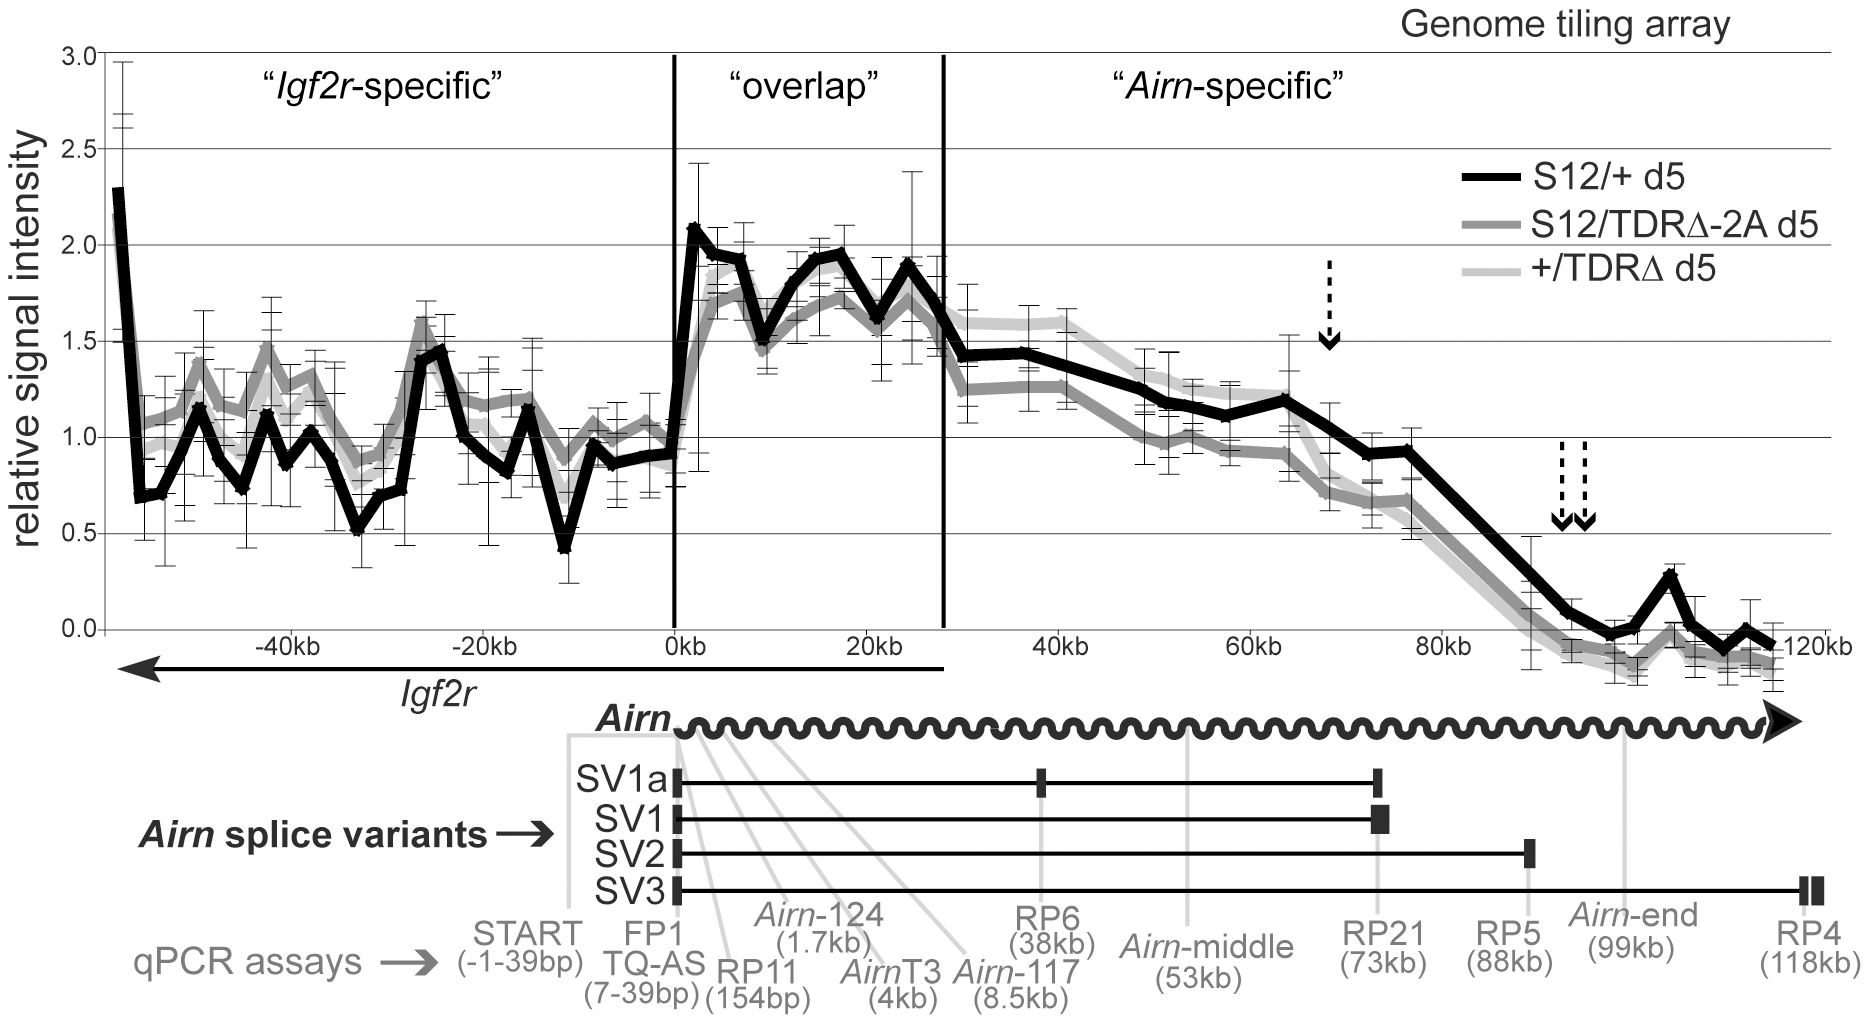 Tandem direct repeats play a role in <i>Airn</i> processivity.